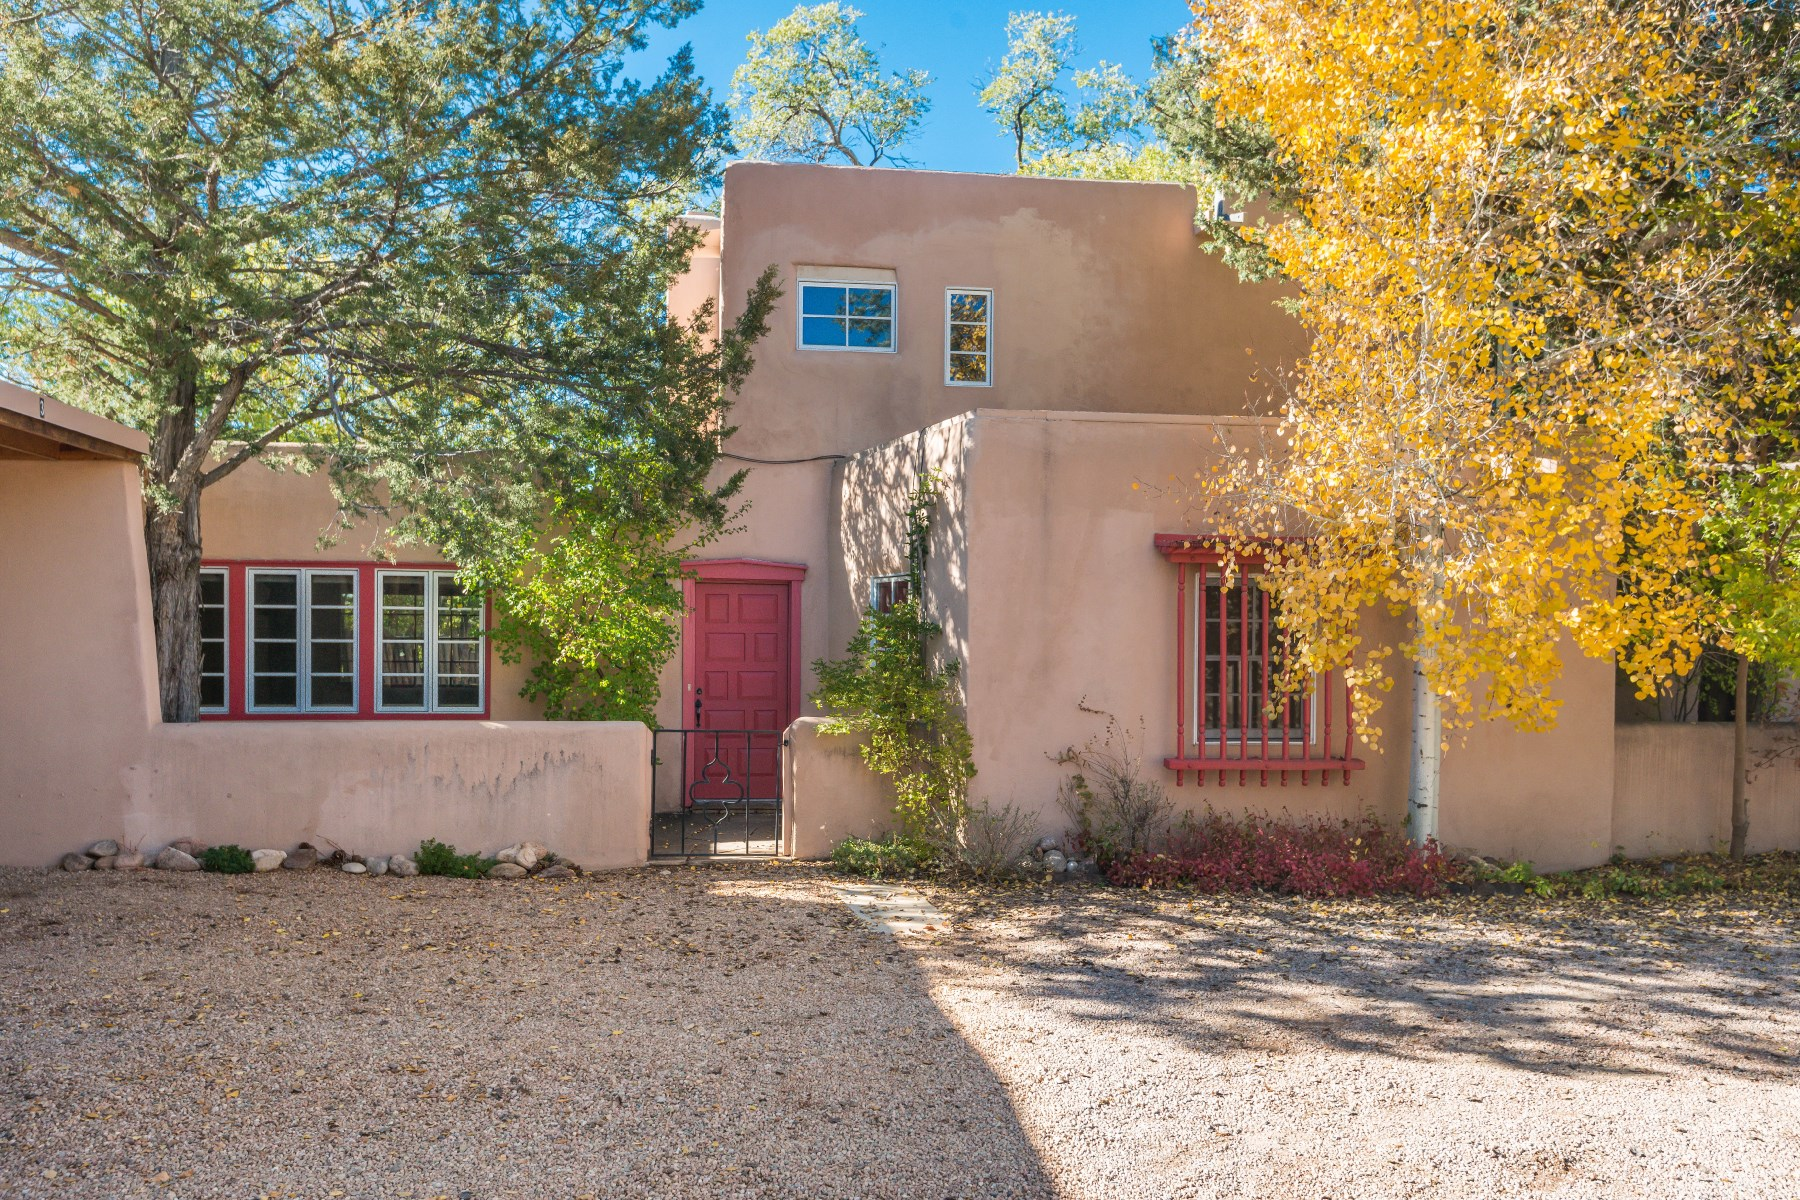 Property For Sale at 112 Camino Escondido Unit 3